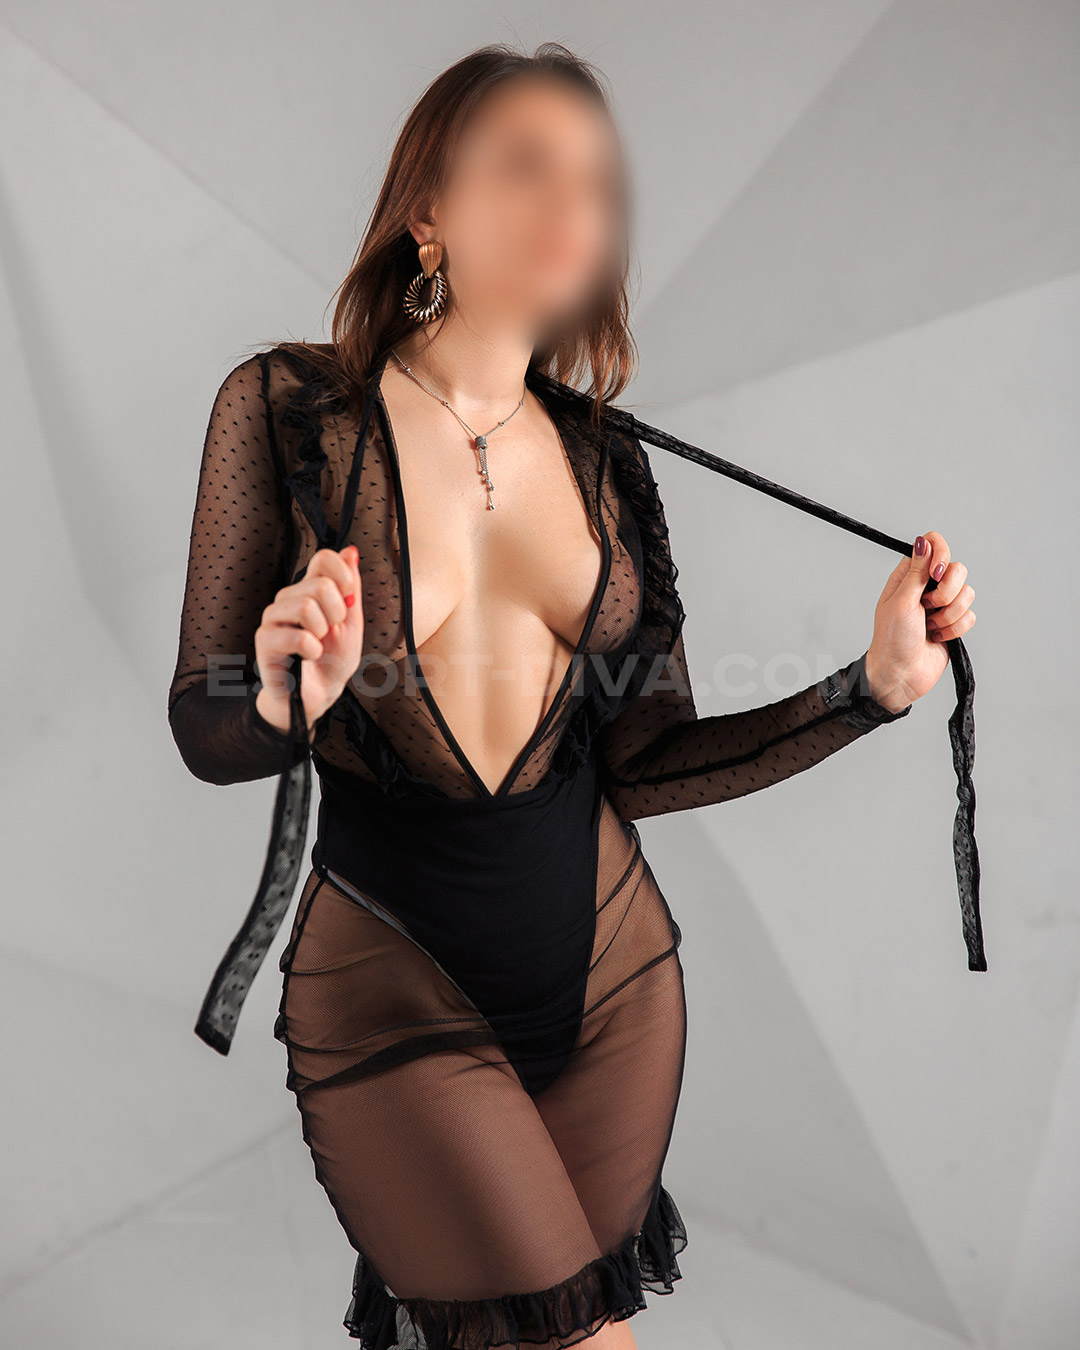 Escort girl ukraine dial an escort becker und funck